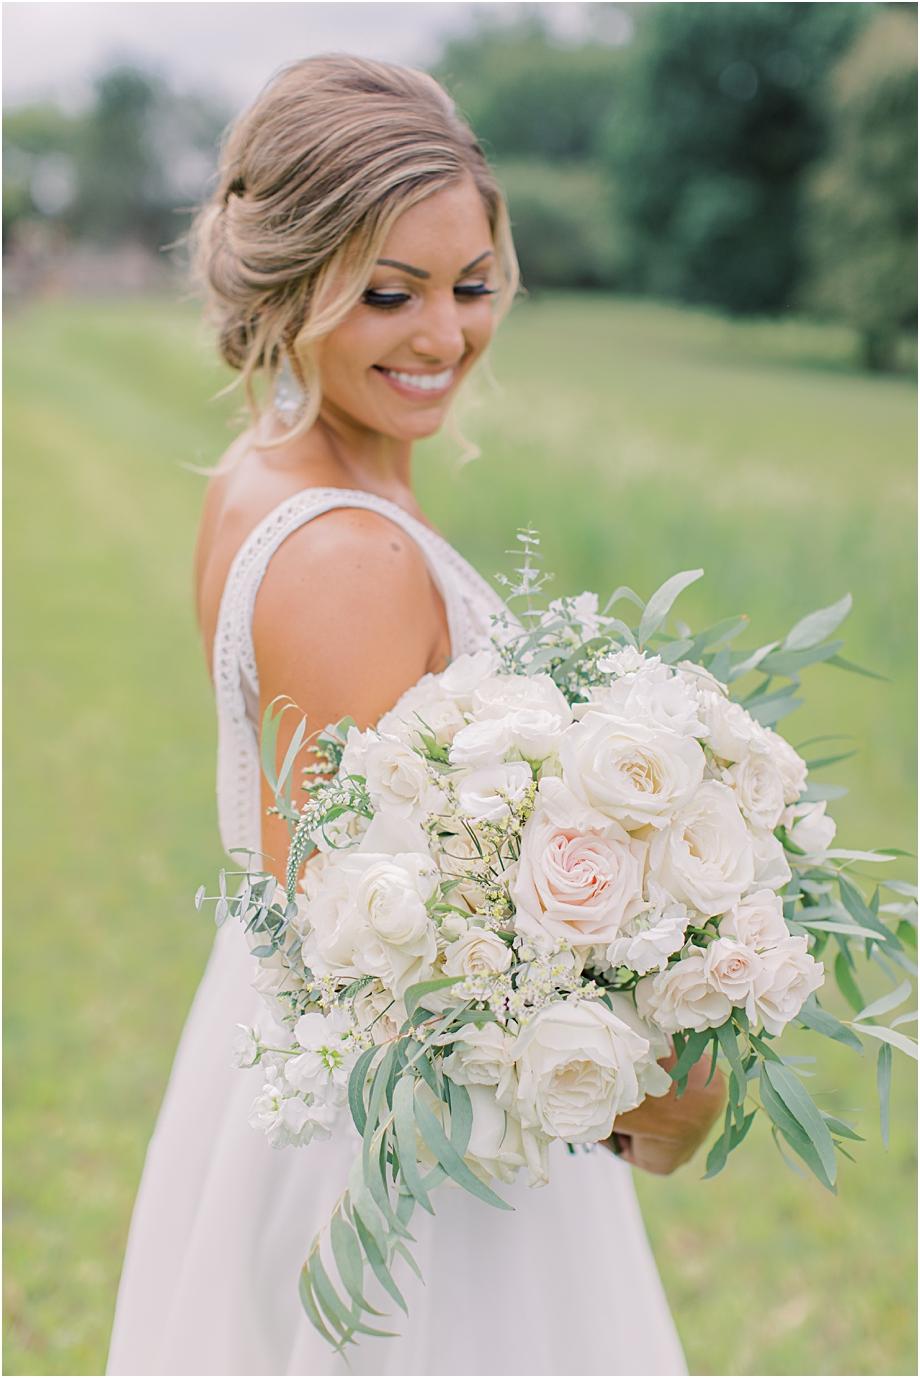 Pastel wedding bouquet by DFW Event Design